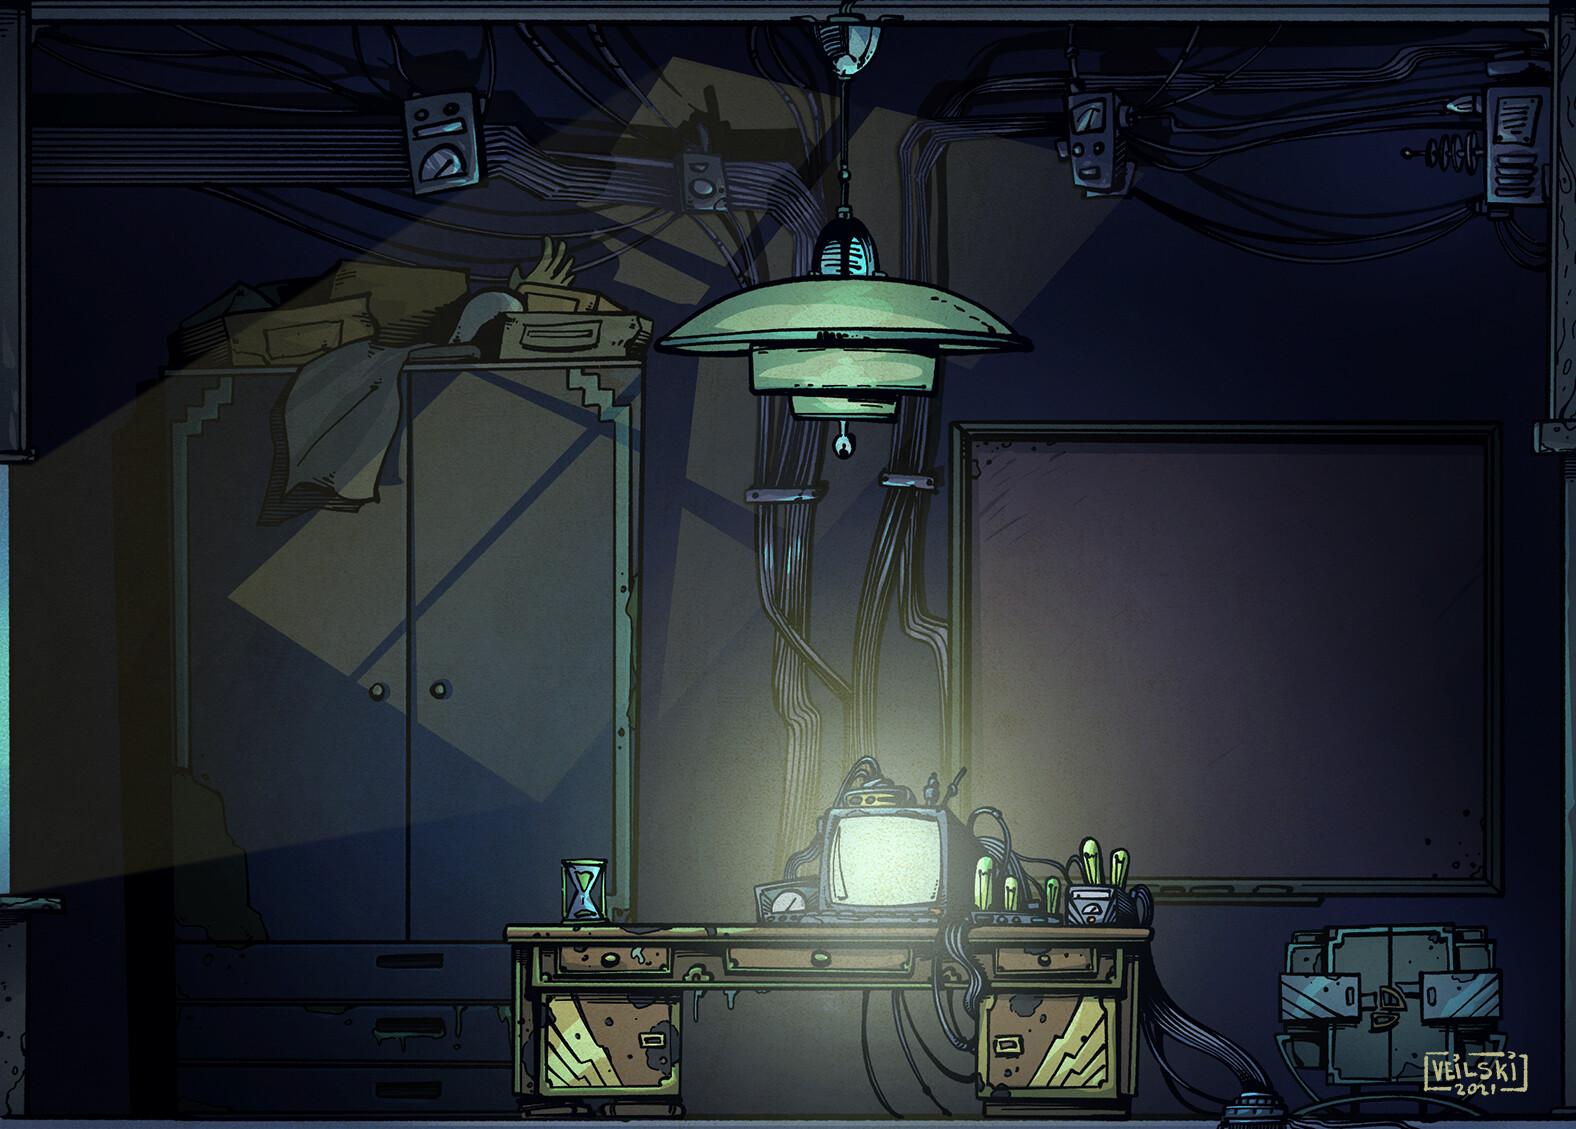 Occultputer pt.1 - Home office